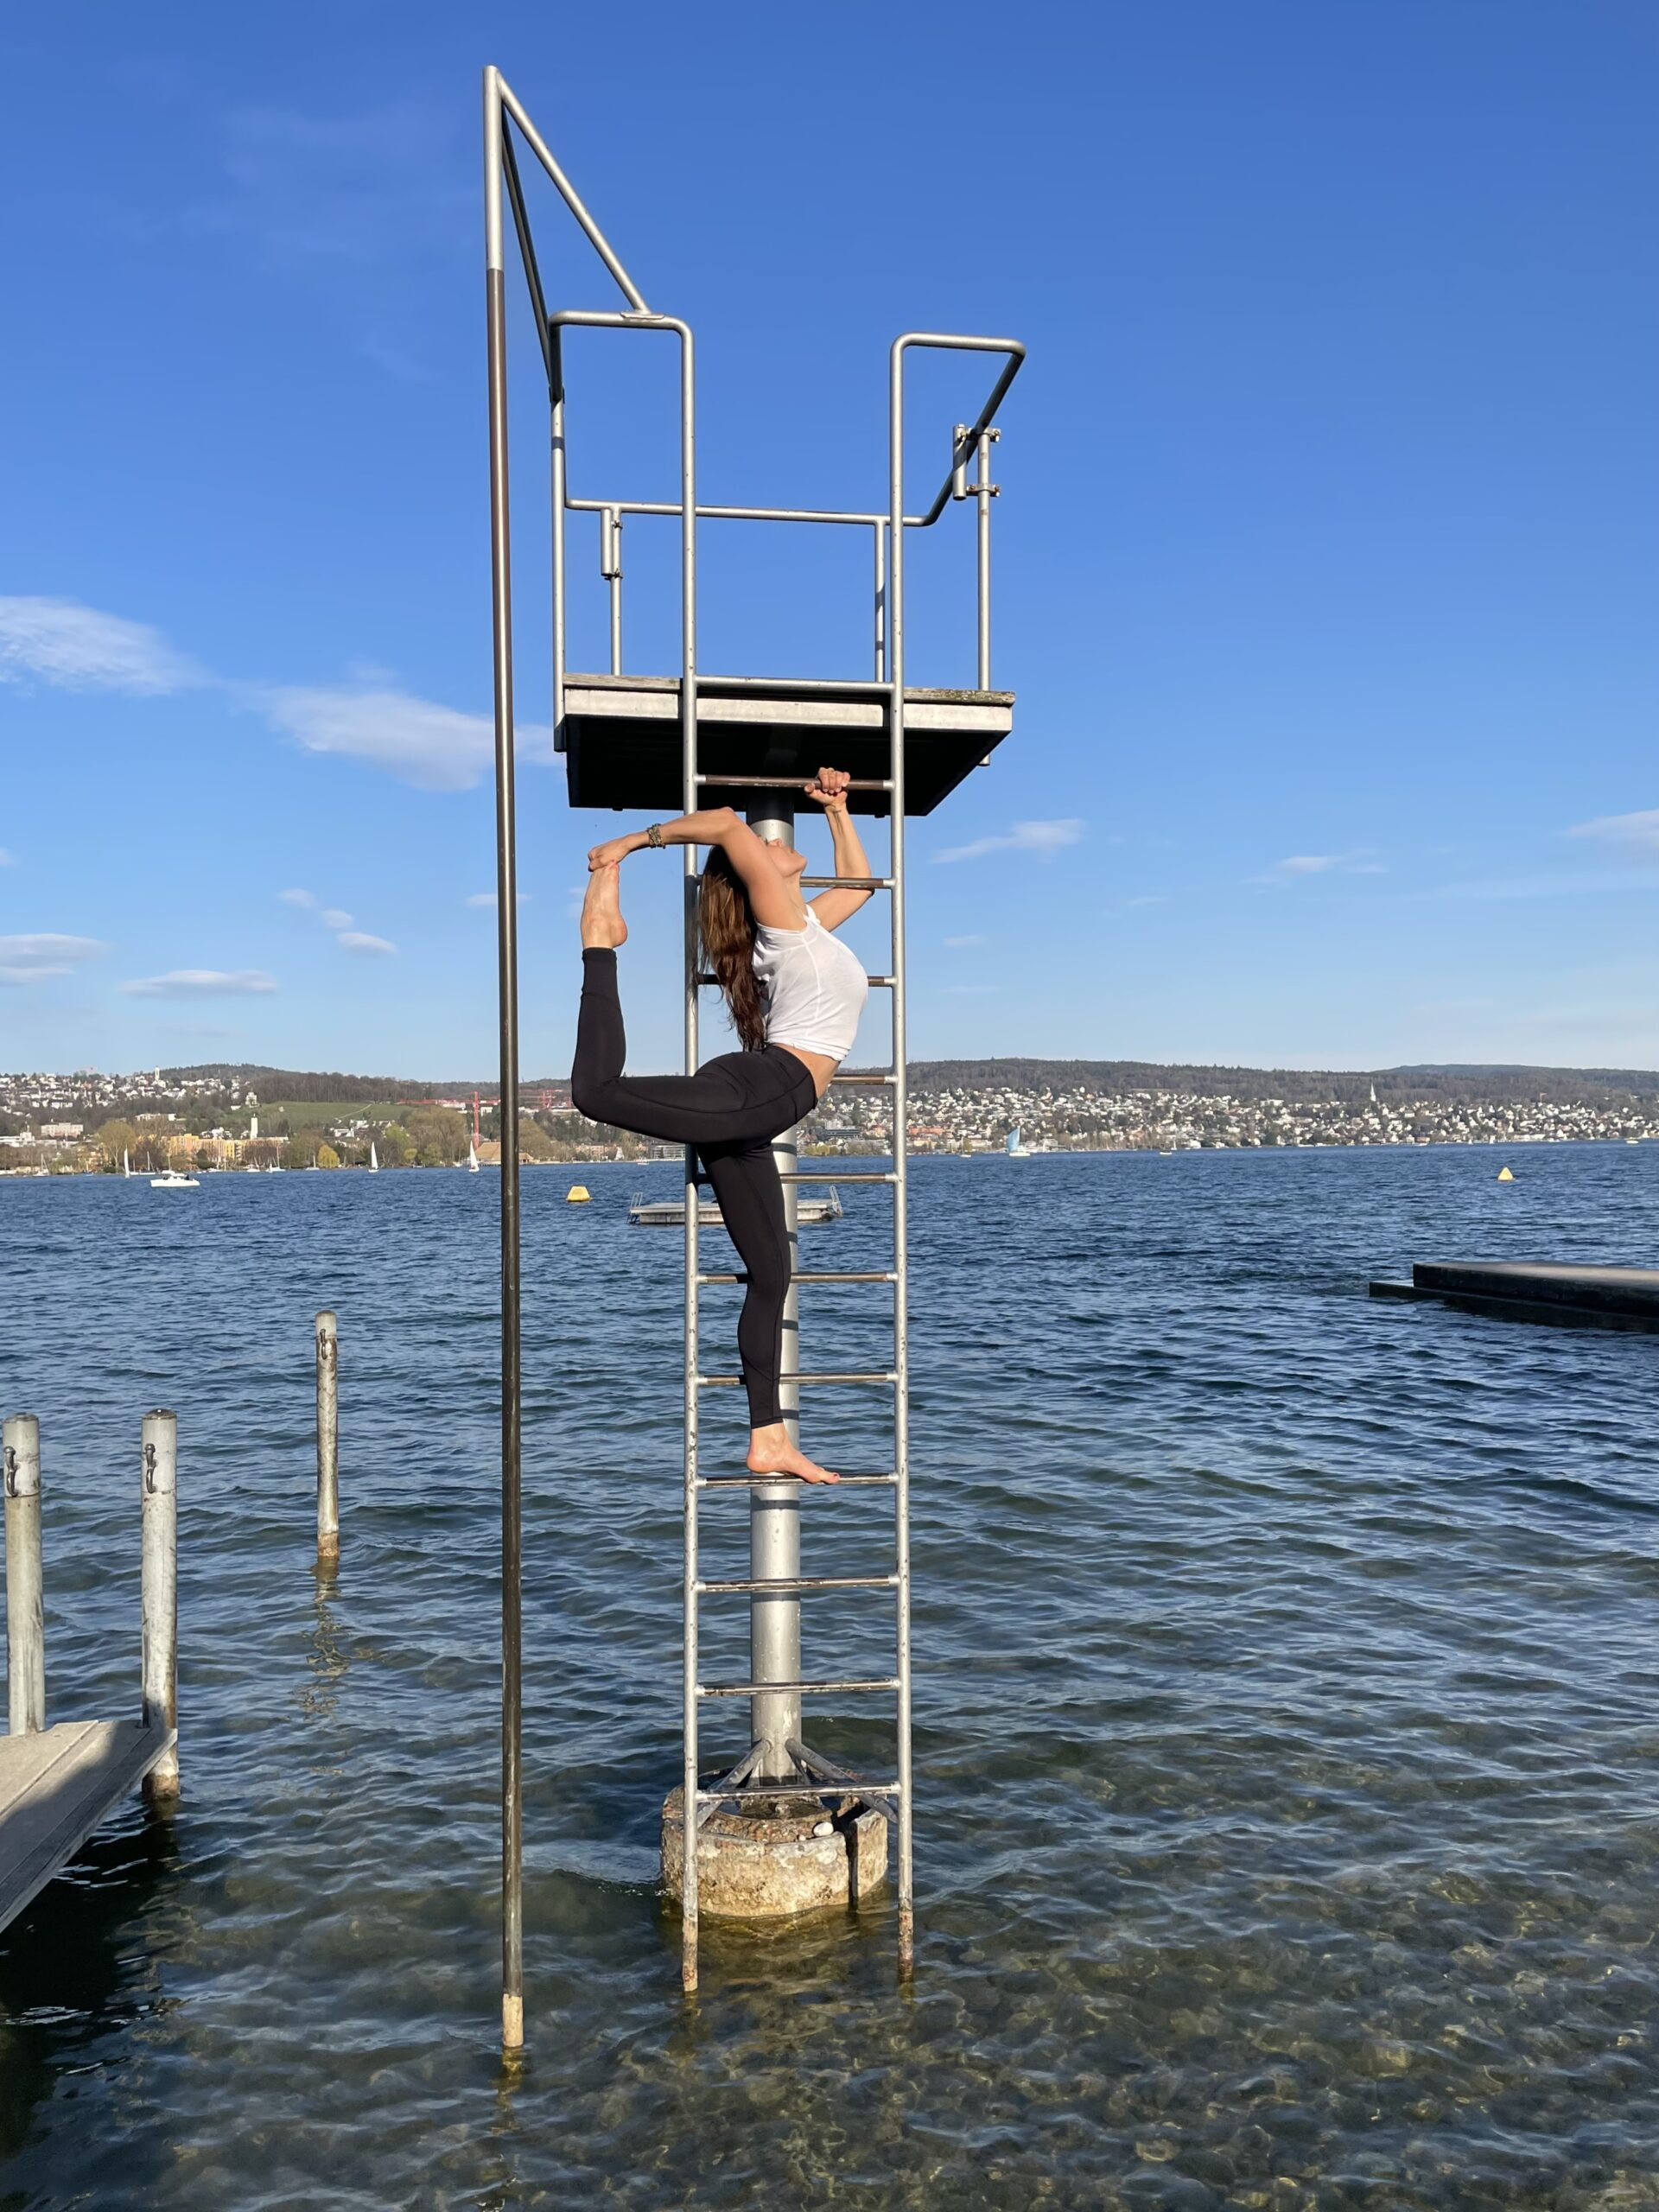 Yoga at lake Zurich